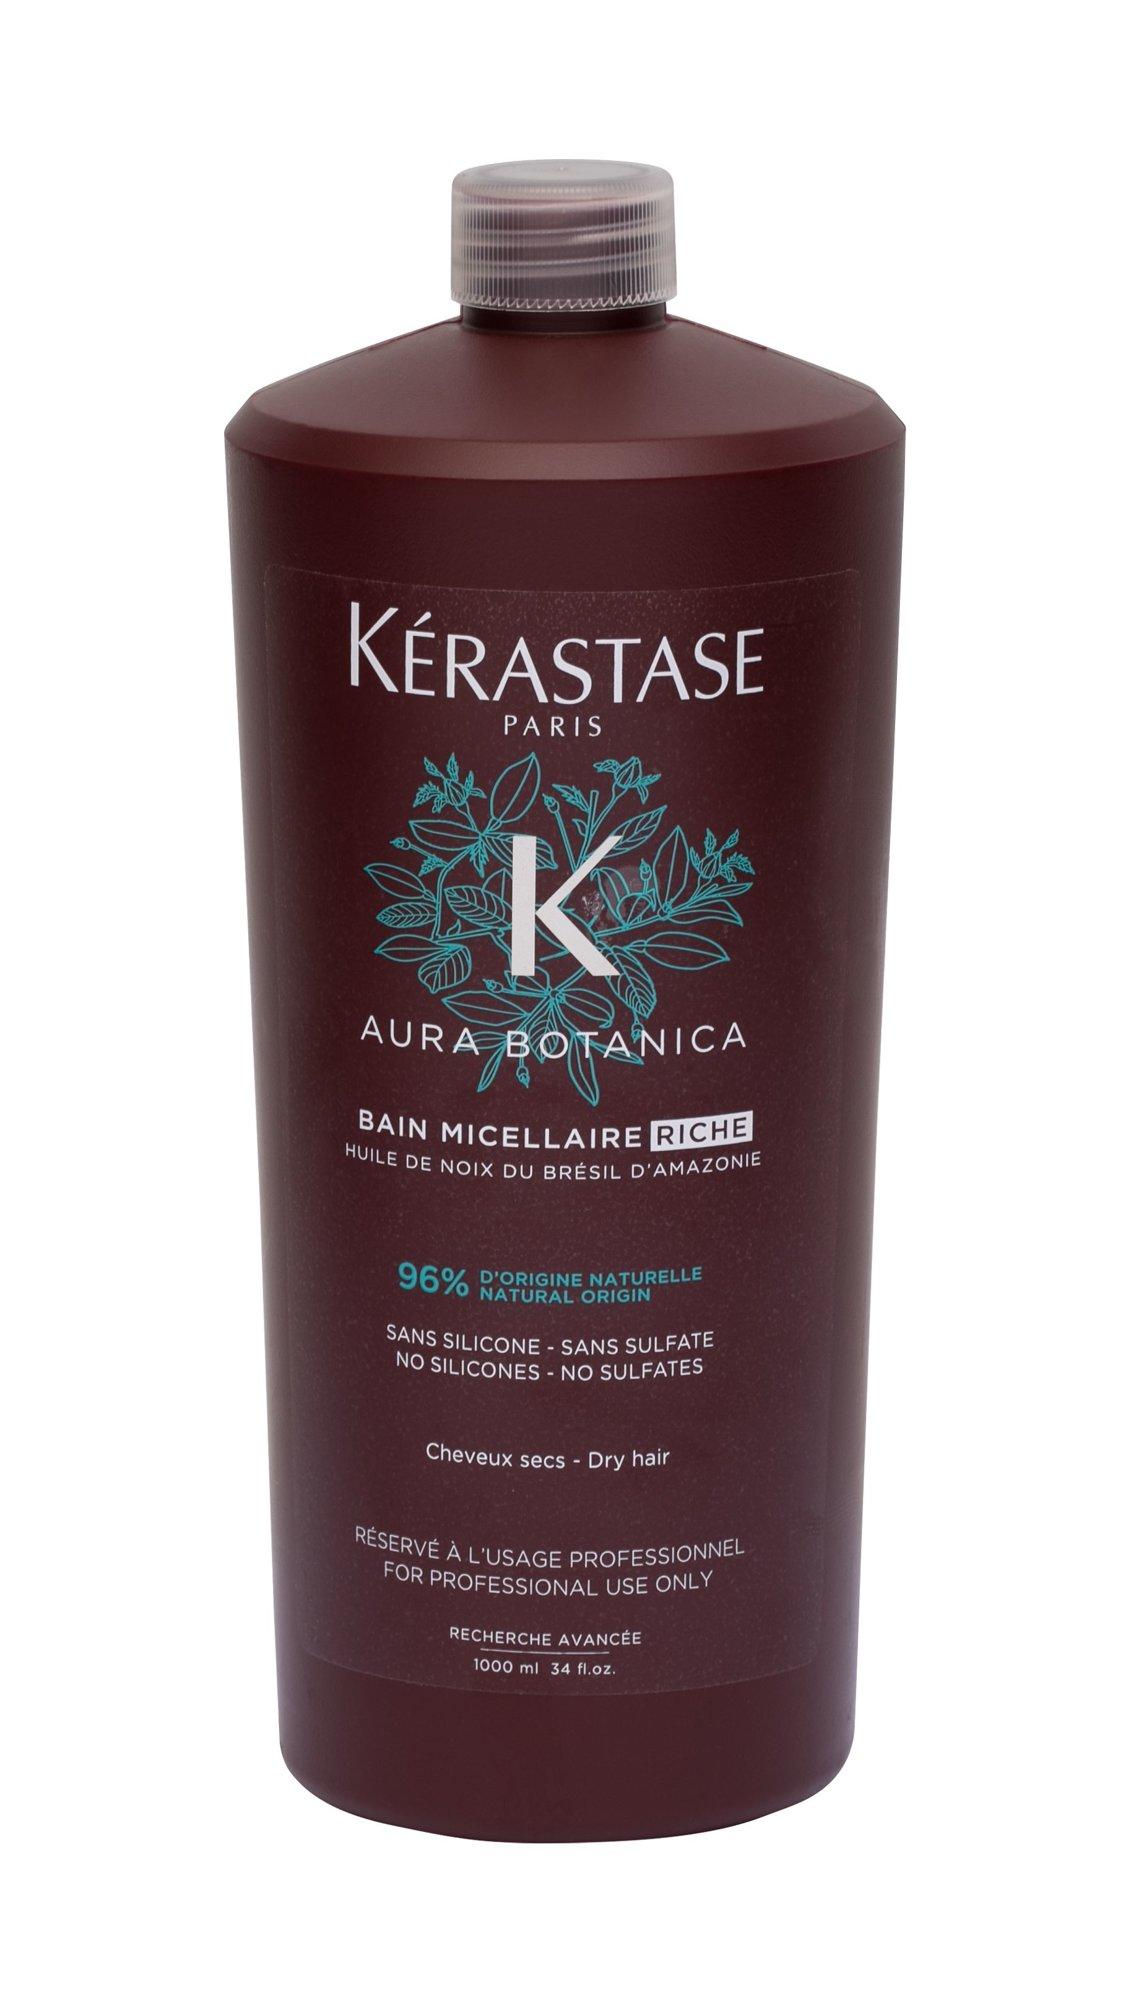 Kérastase Aura Botanica Shampoo 1000ml